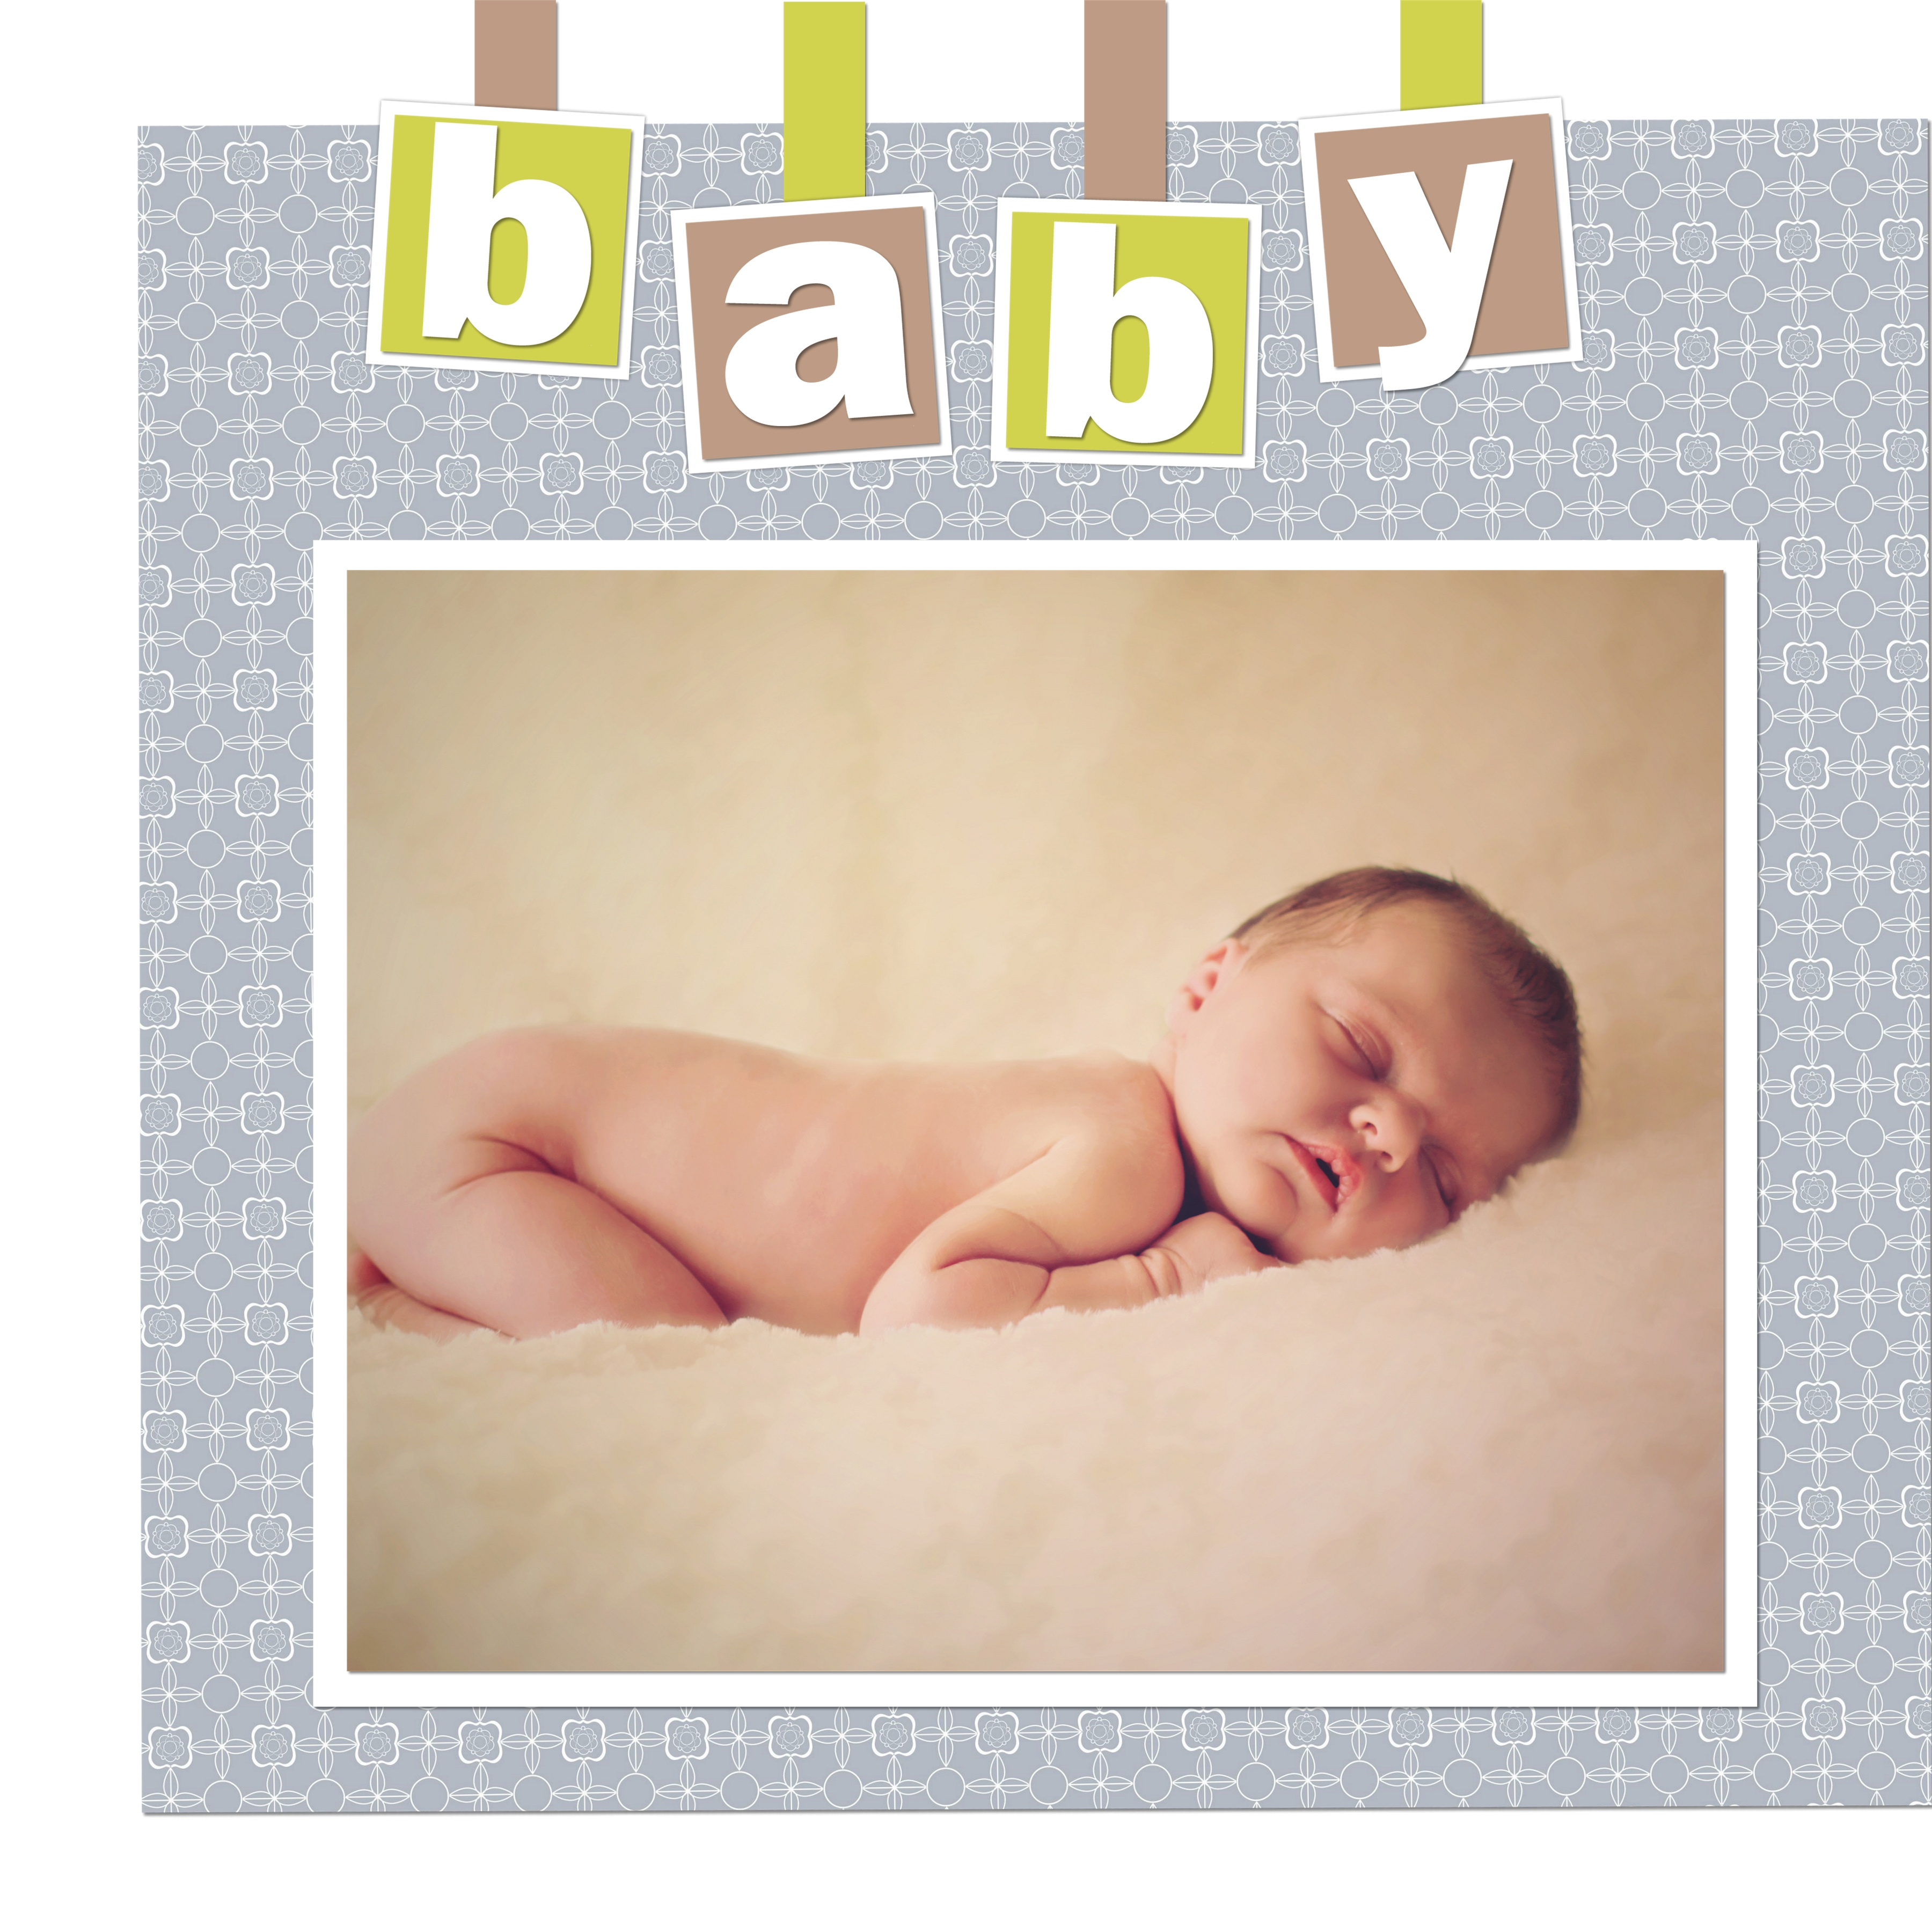 BabyBoy - Page 008.jpg